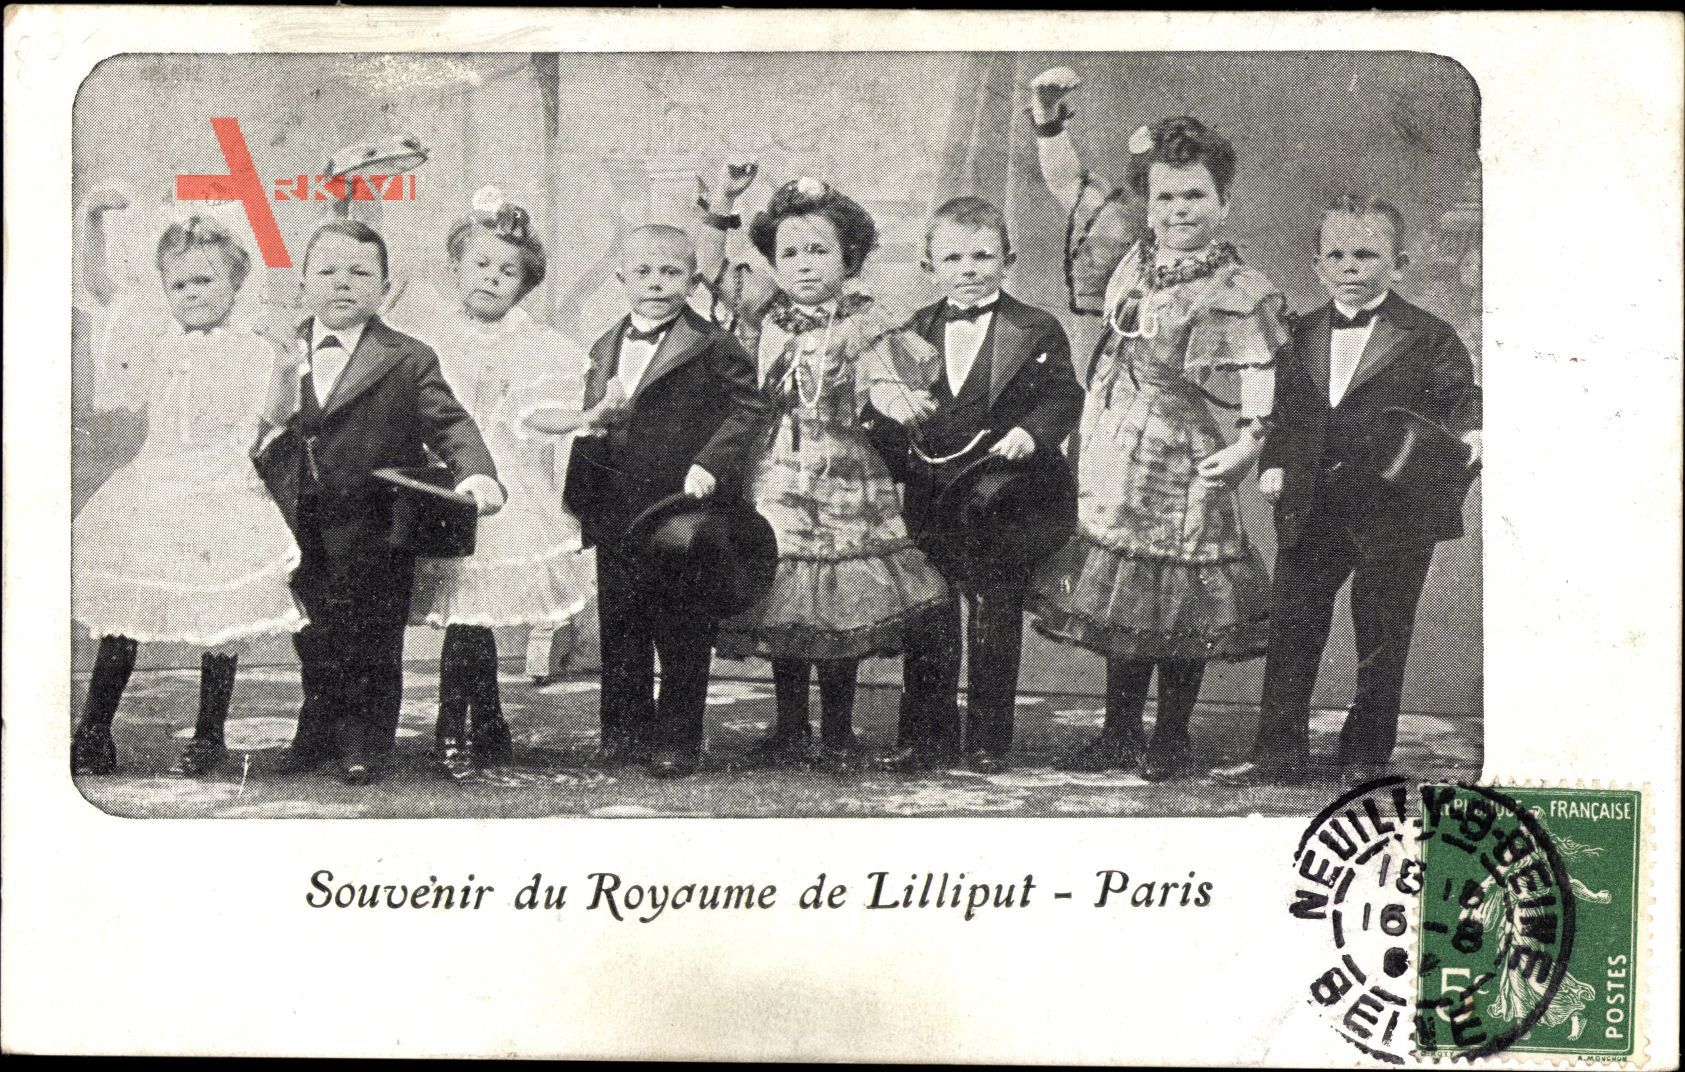 Paris, Souvenir du Royaume de Liliput, Liliputaner, Tänzer